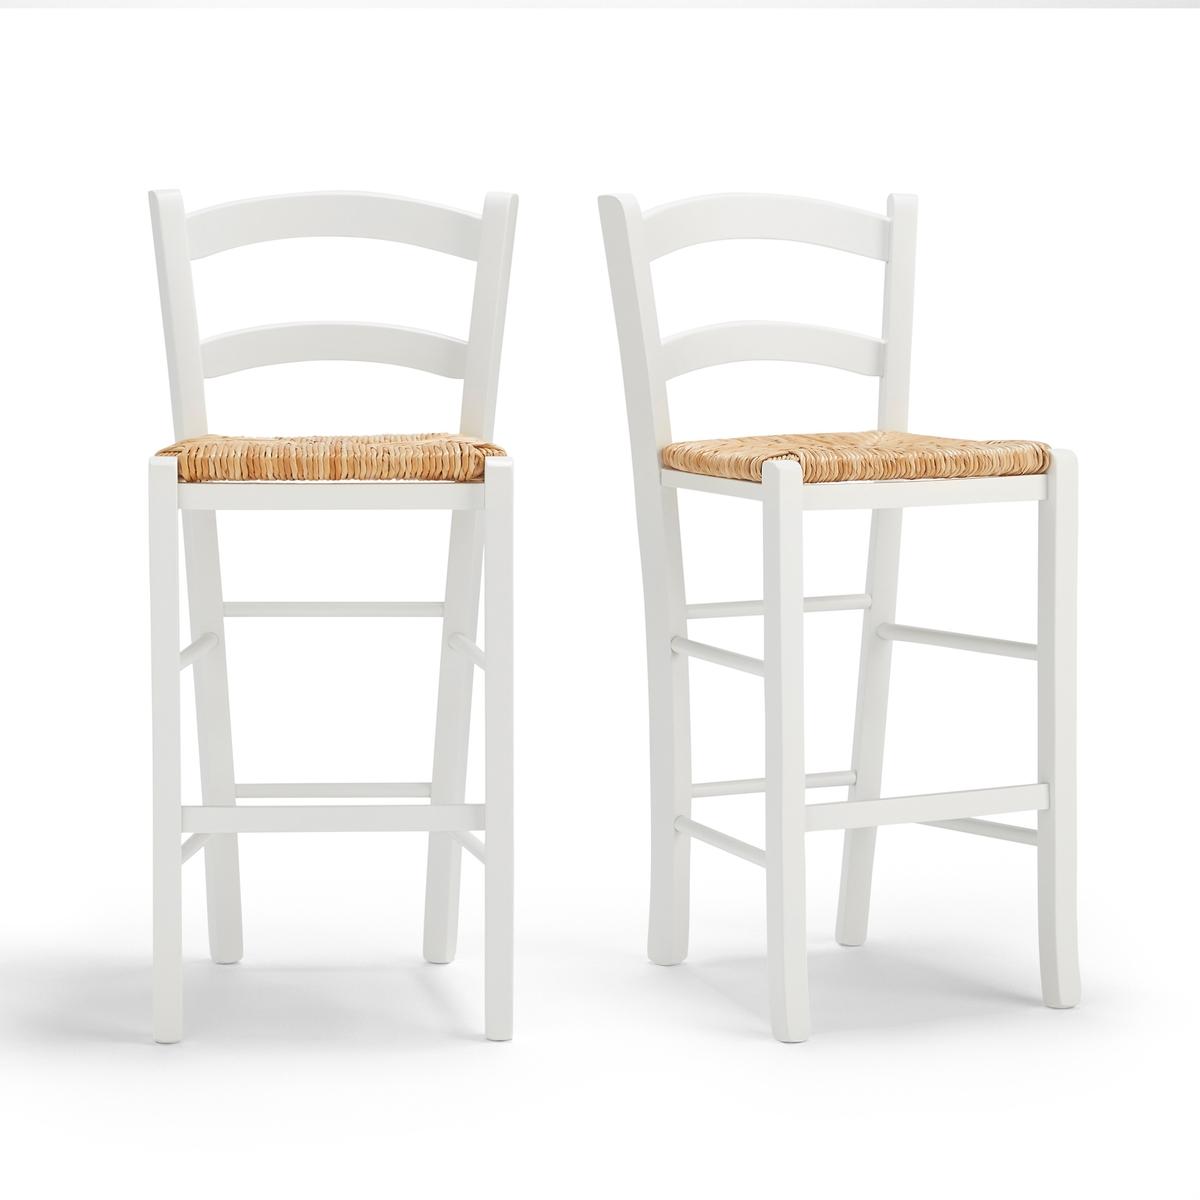 2 стула барных средней длины PERRINE